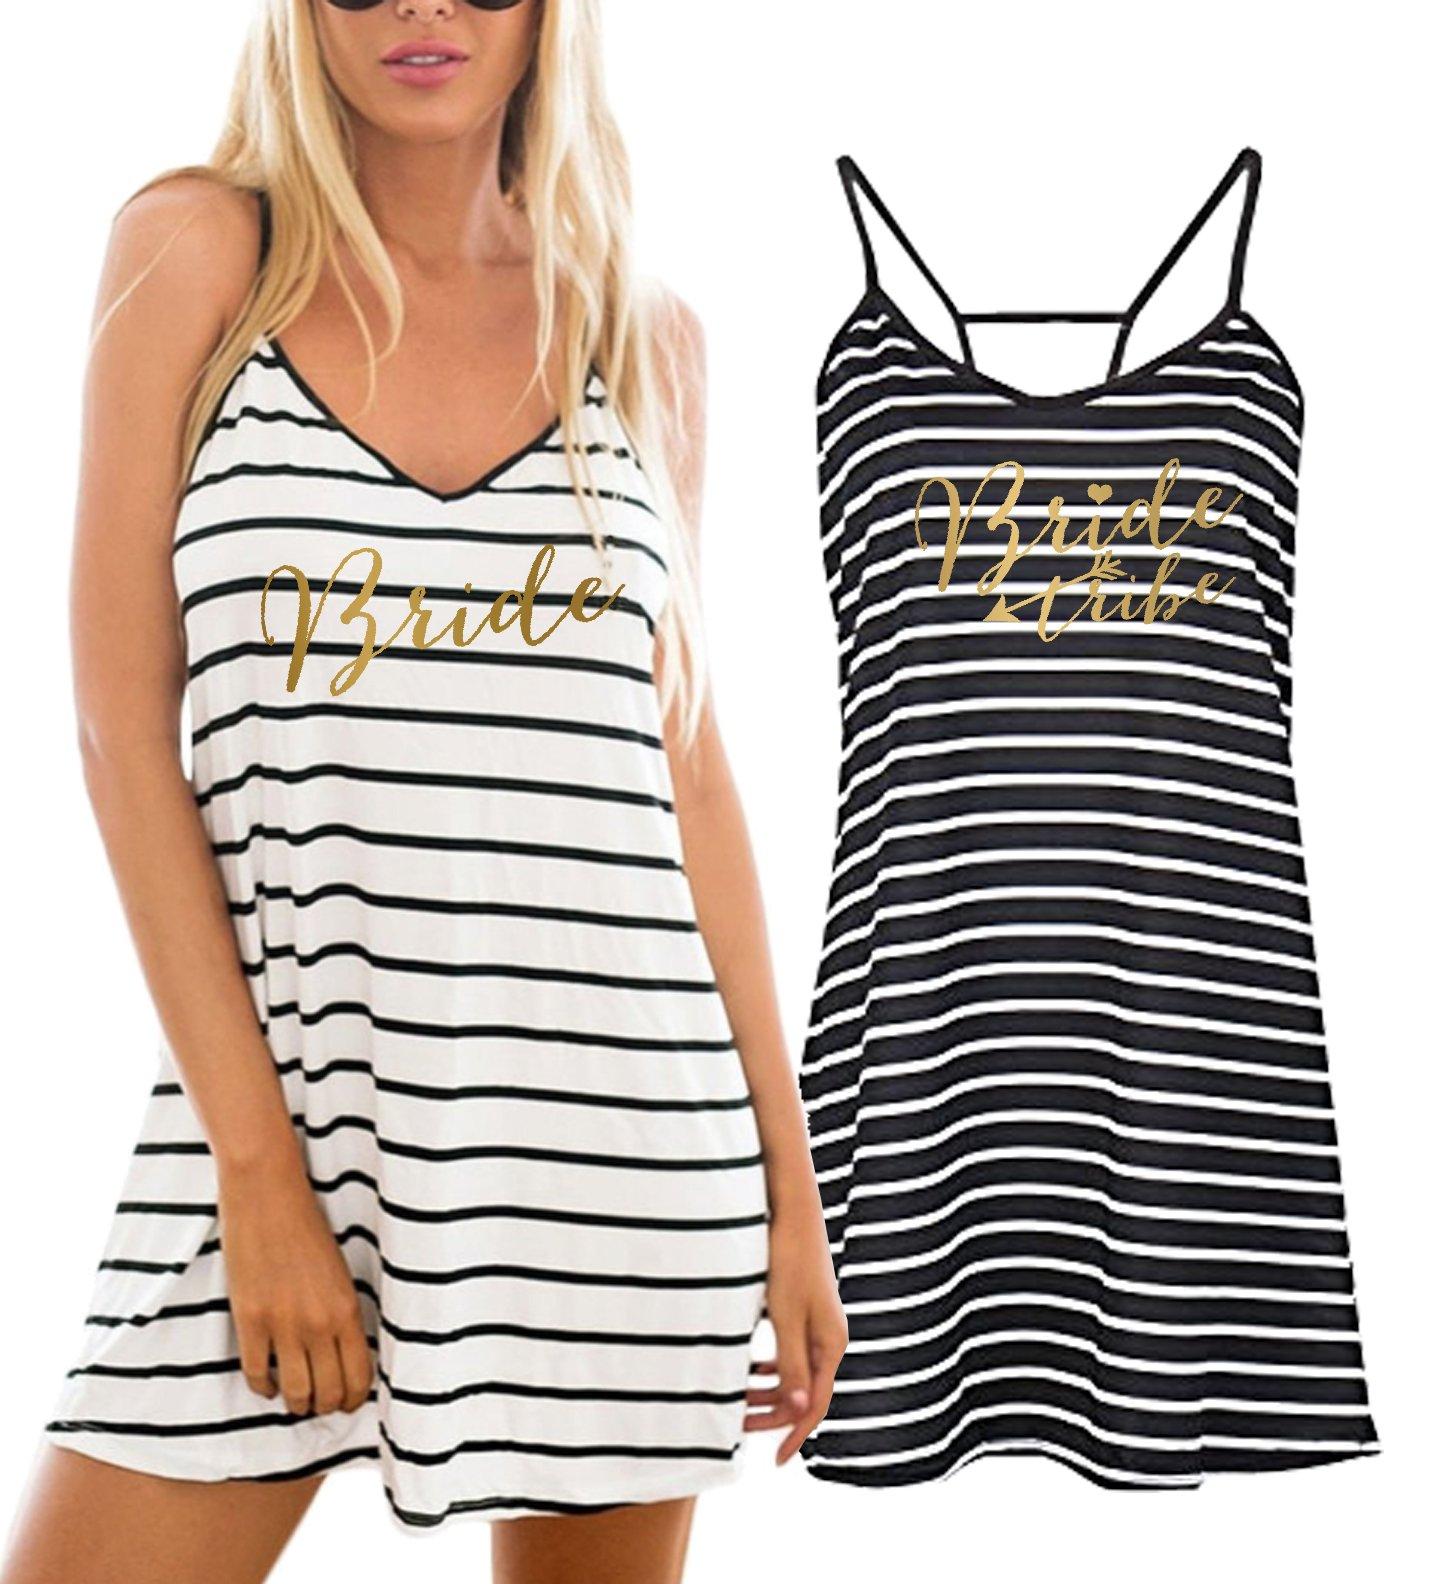 Gold Bride Bride Tribe Striped Swimsuit Cover up Beach Dress (Black W/White Stripe - Bride Tribe,2X,)